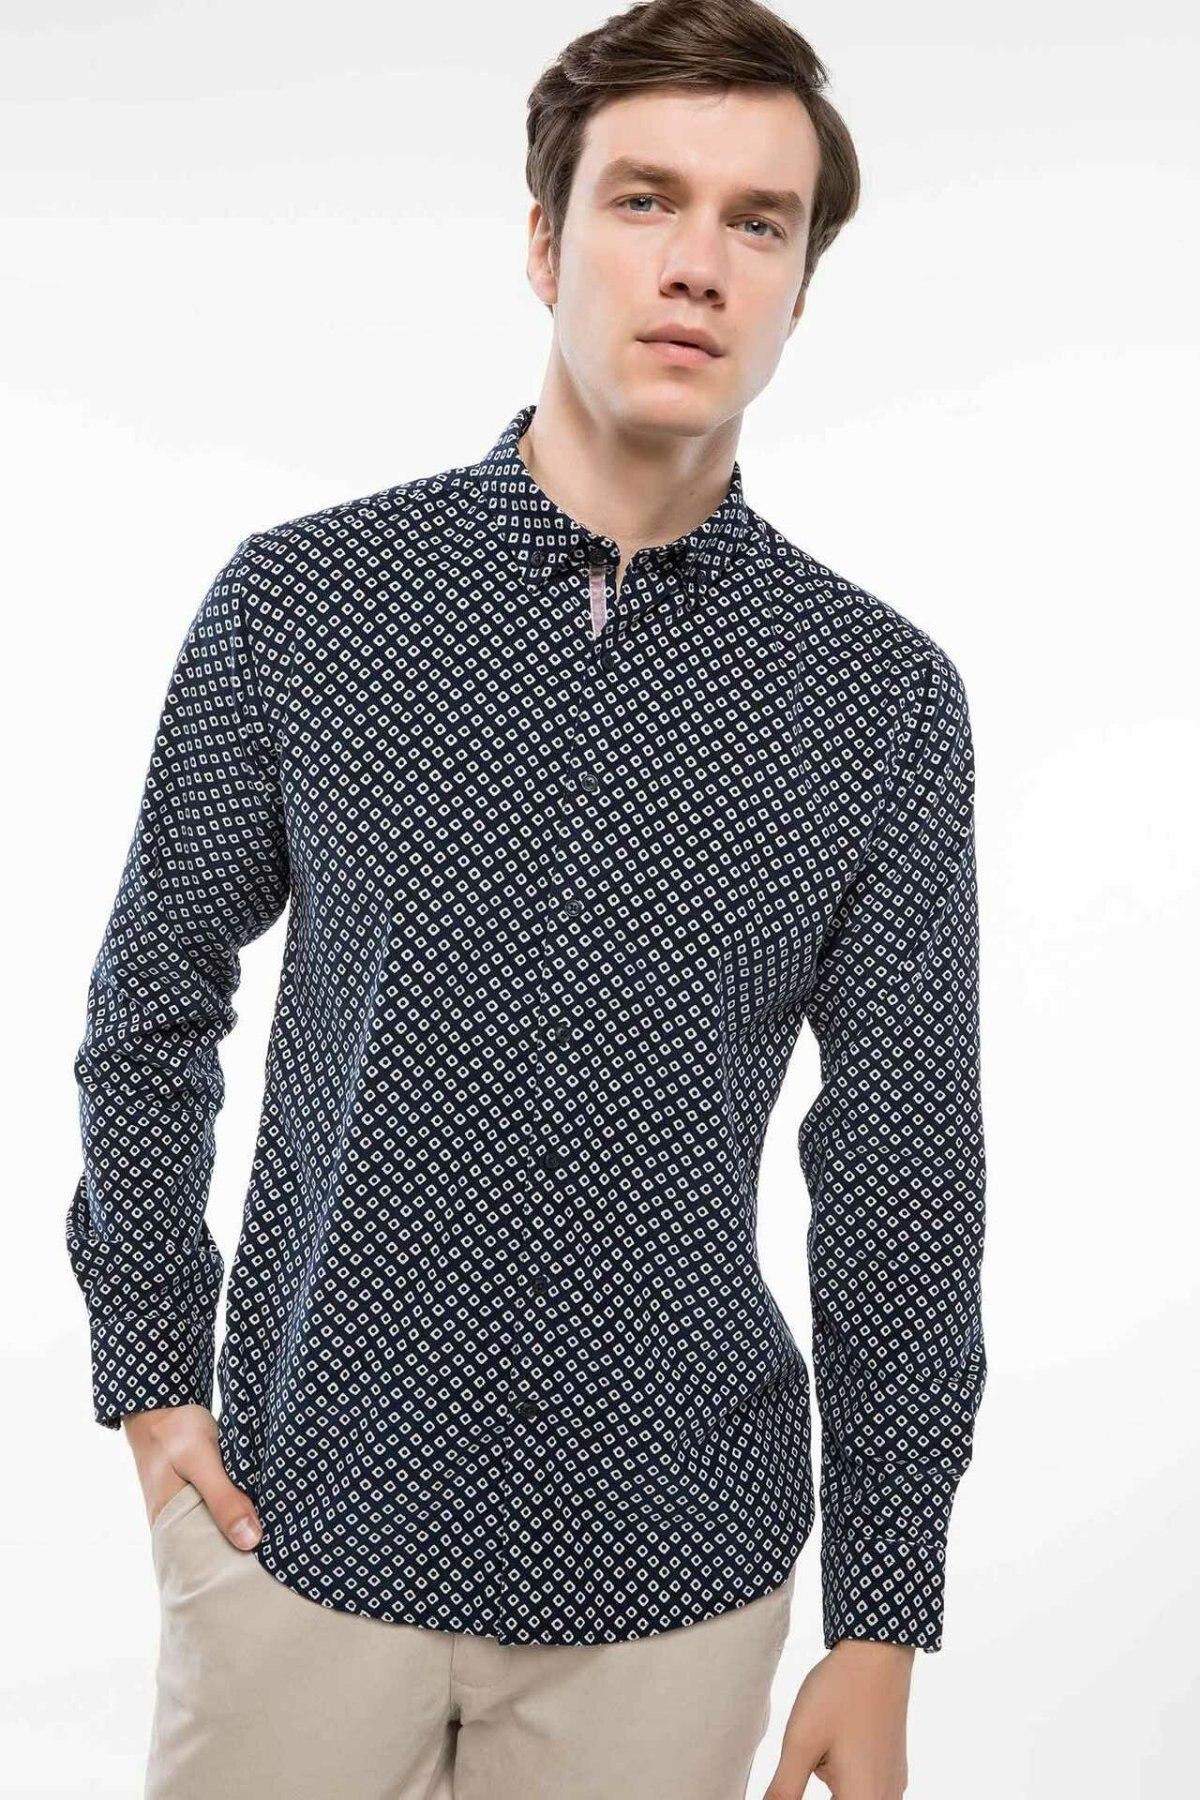 DeFacto Fashion Men Formal Long Sleeve Shirt Male Casual Comfort Blouser Men's Leisure Loose Dot Shirts Autumn - I9291AZ18WN